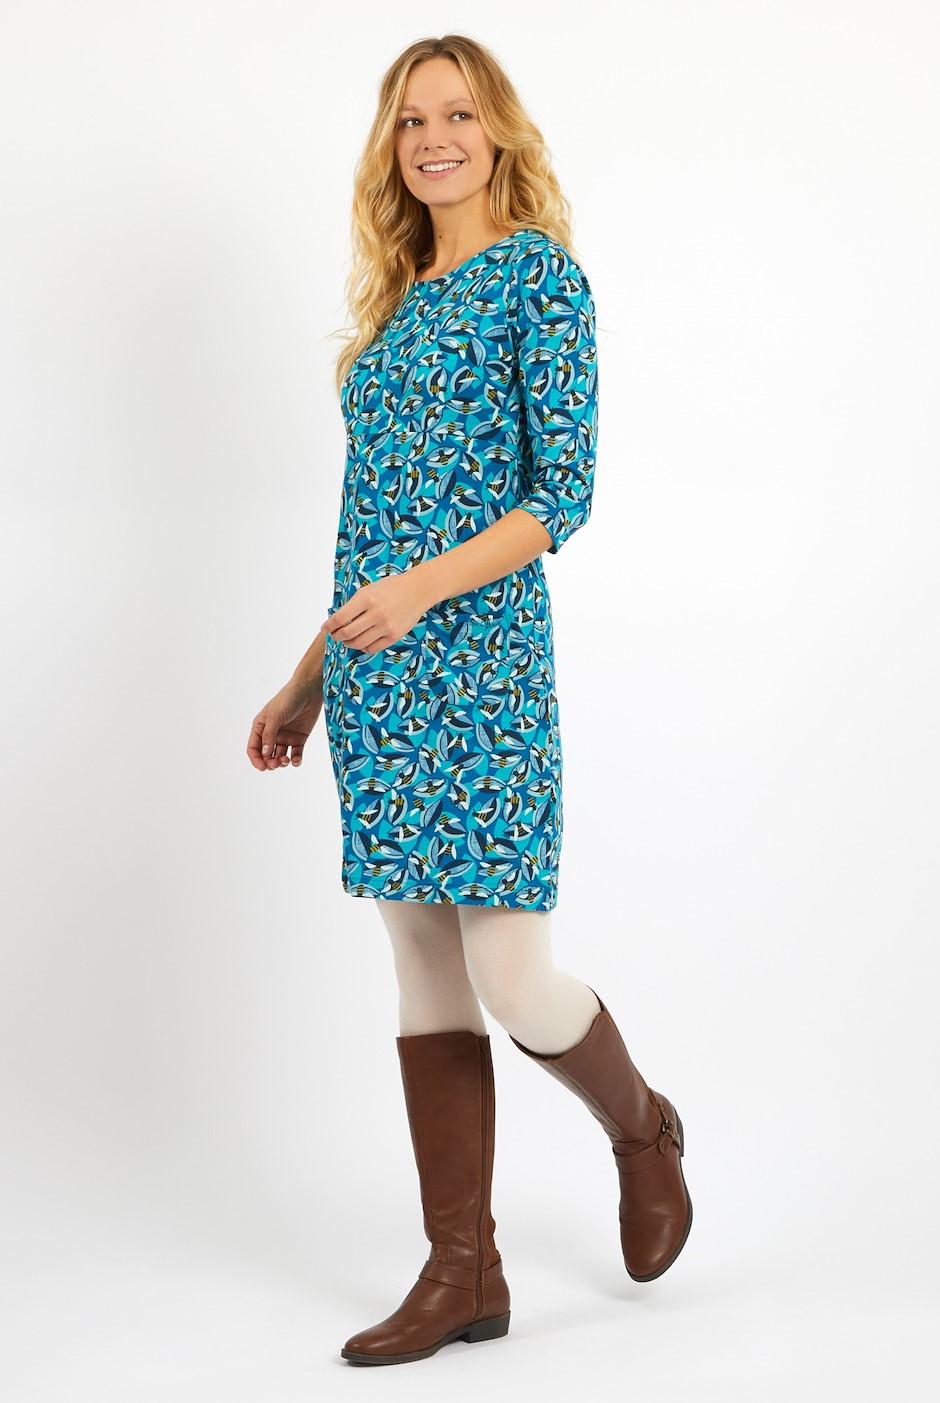 Starshine Printed  Jersey Dress Storm Blue